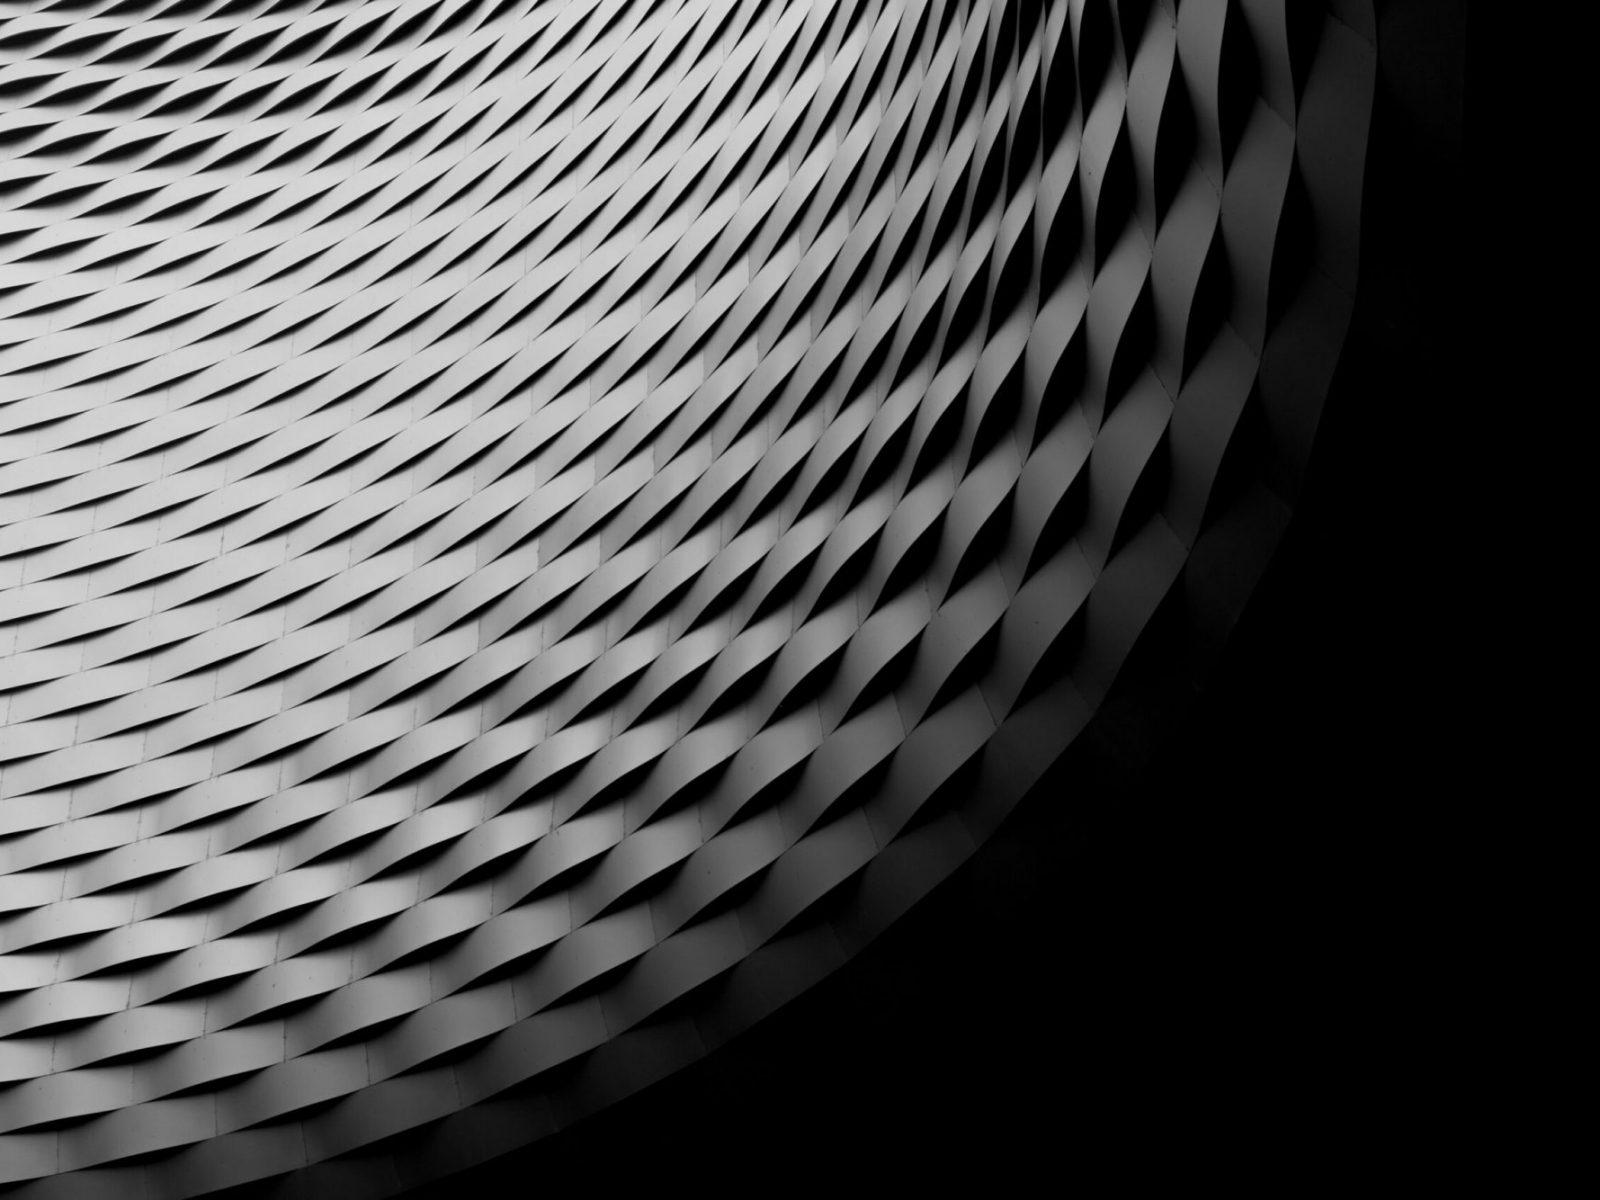 pexels-camille-staehler-2293507